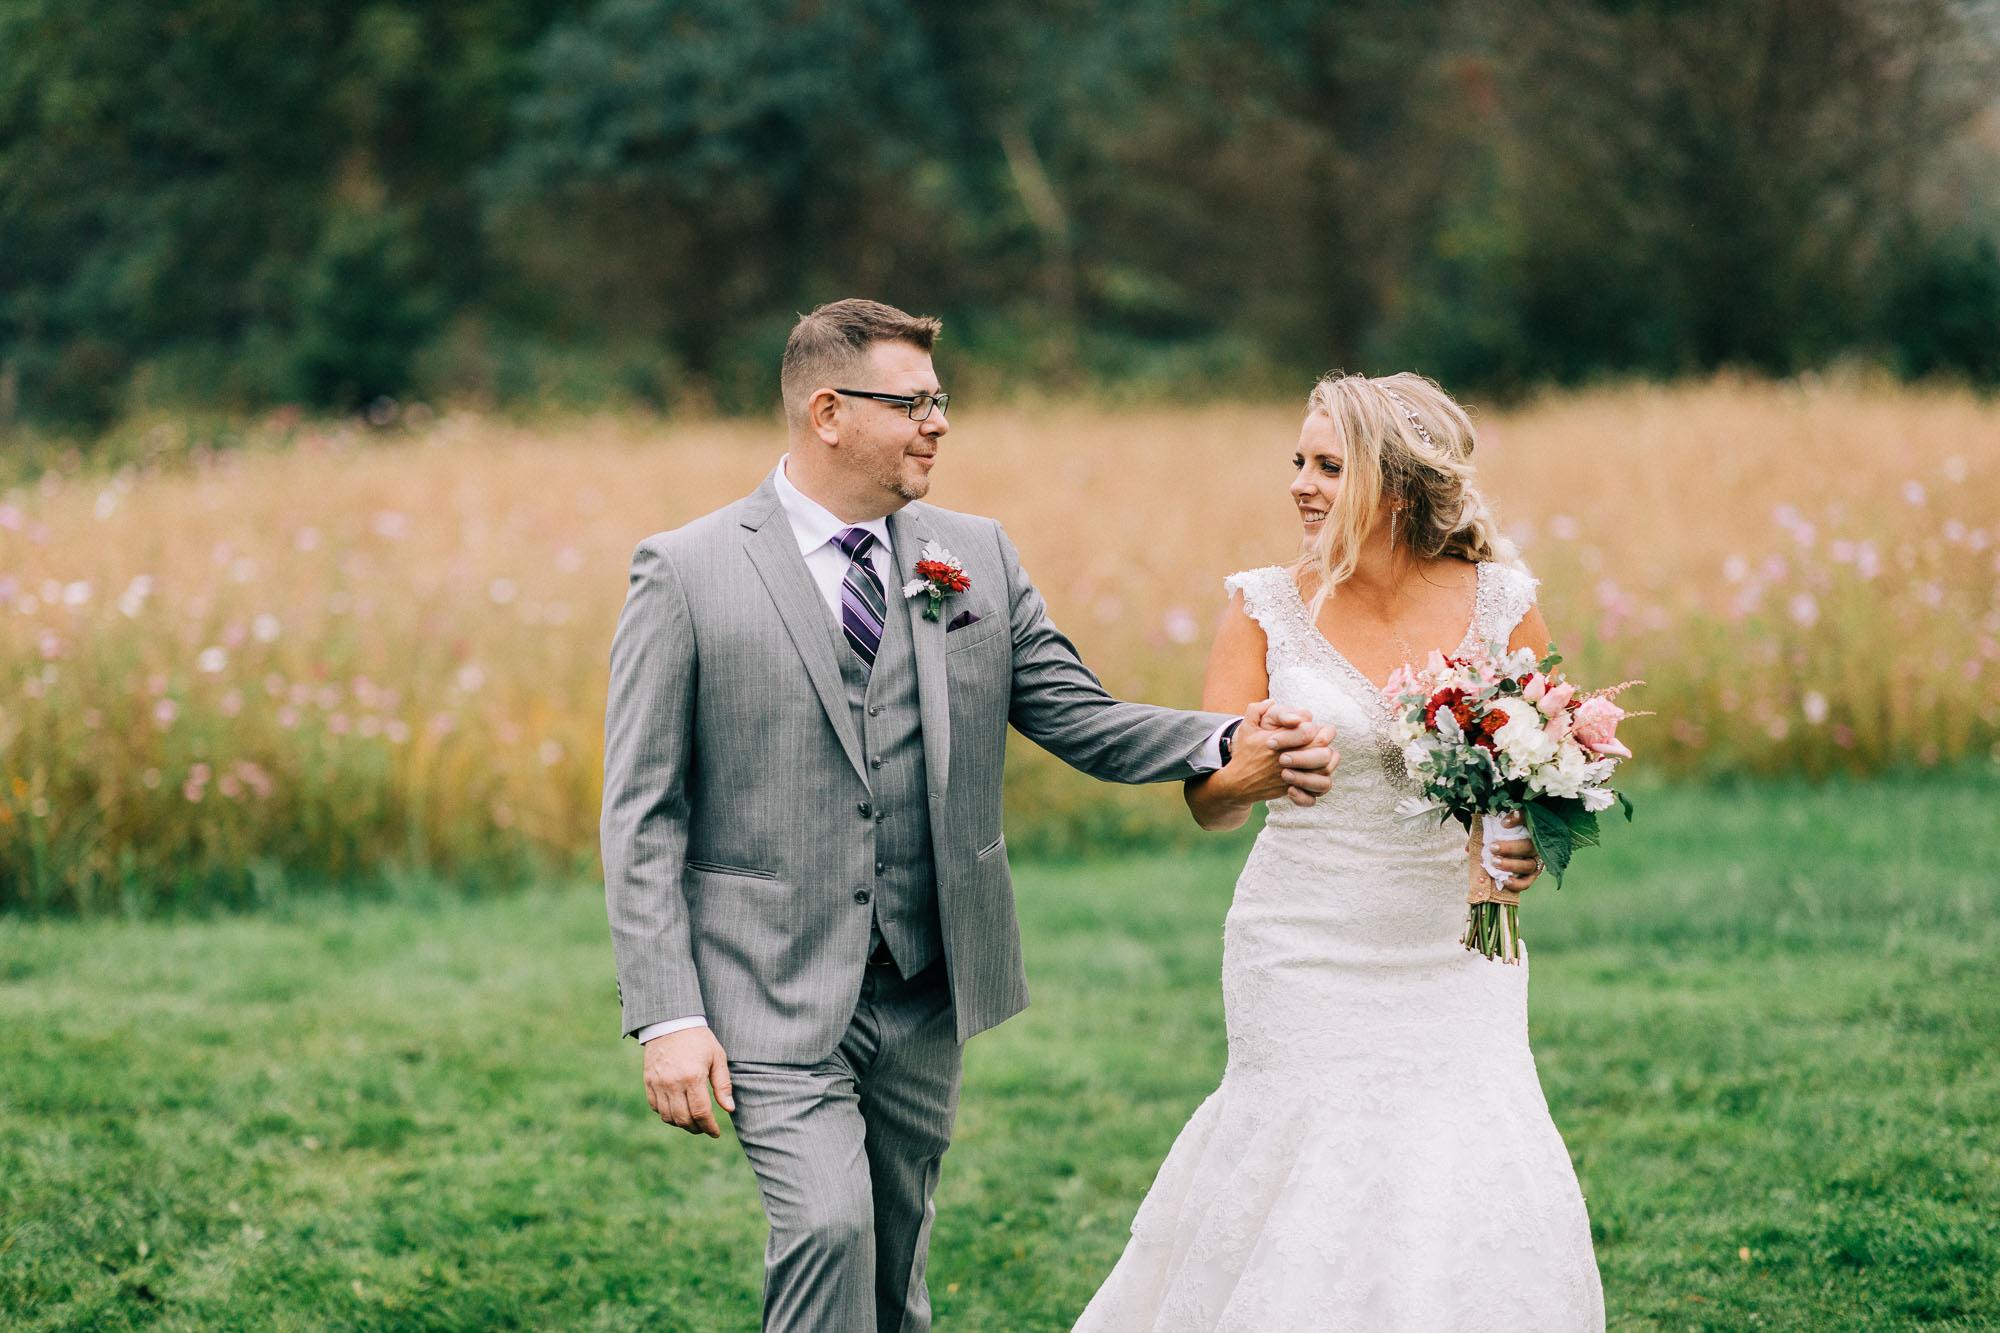 Lodge-at-Raven-Creek-October-wedding-62.jpg